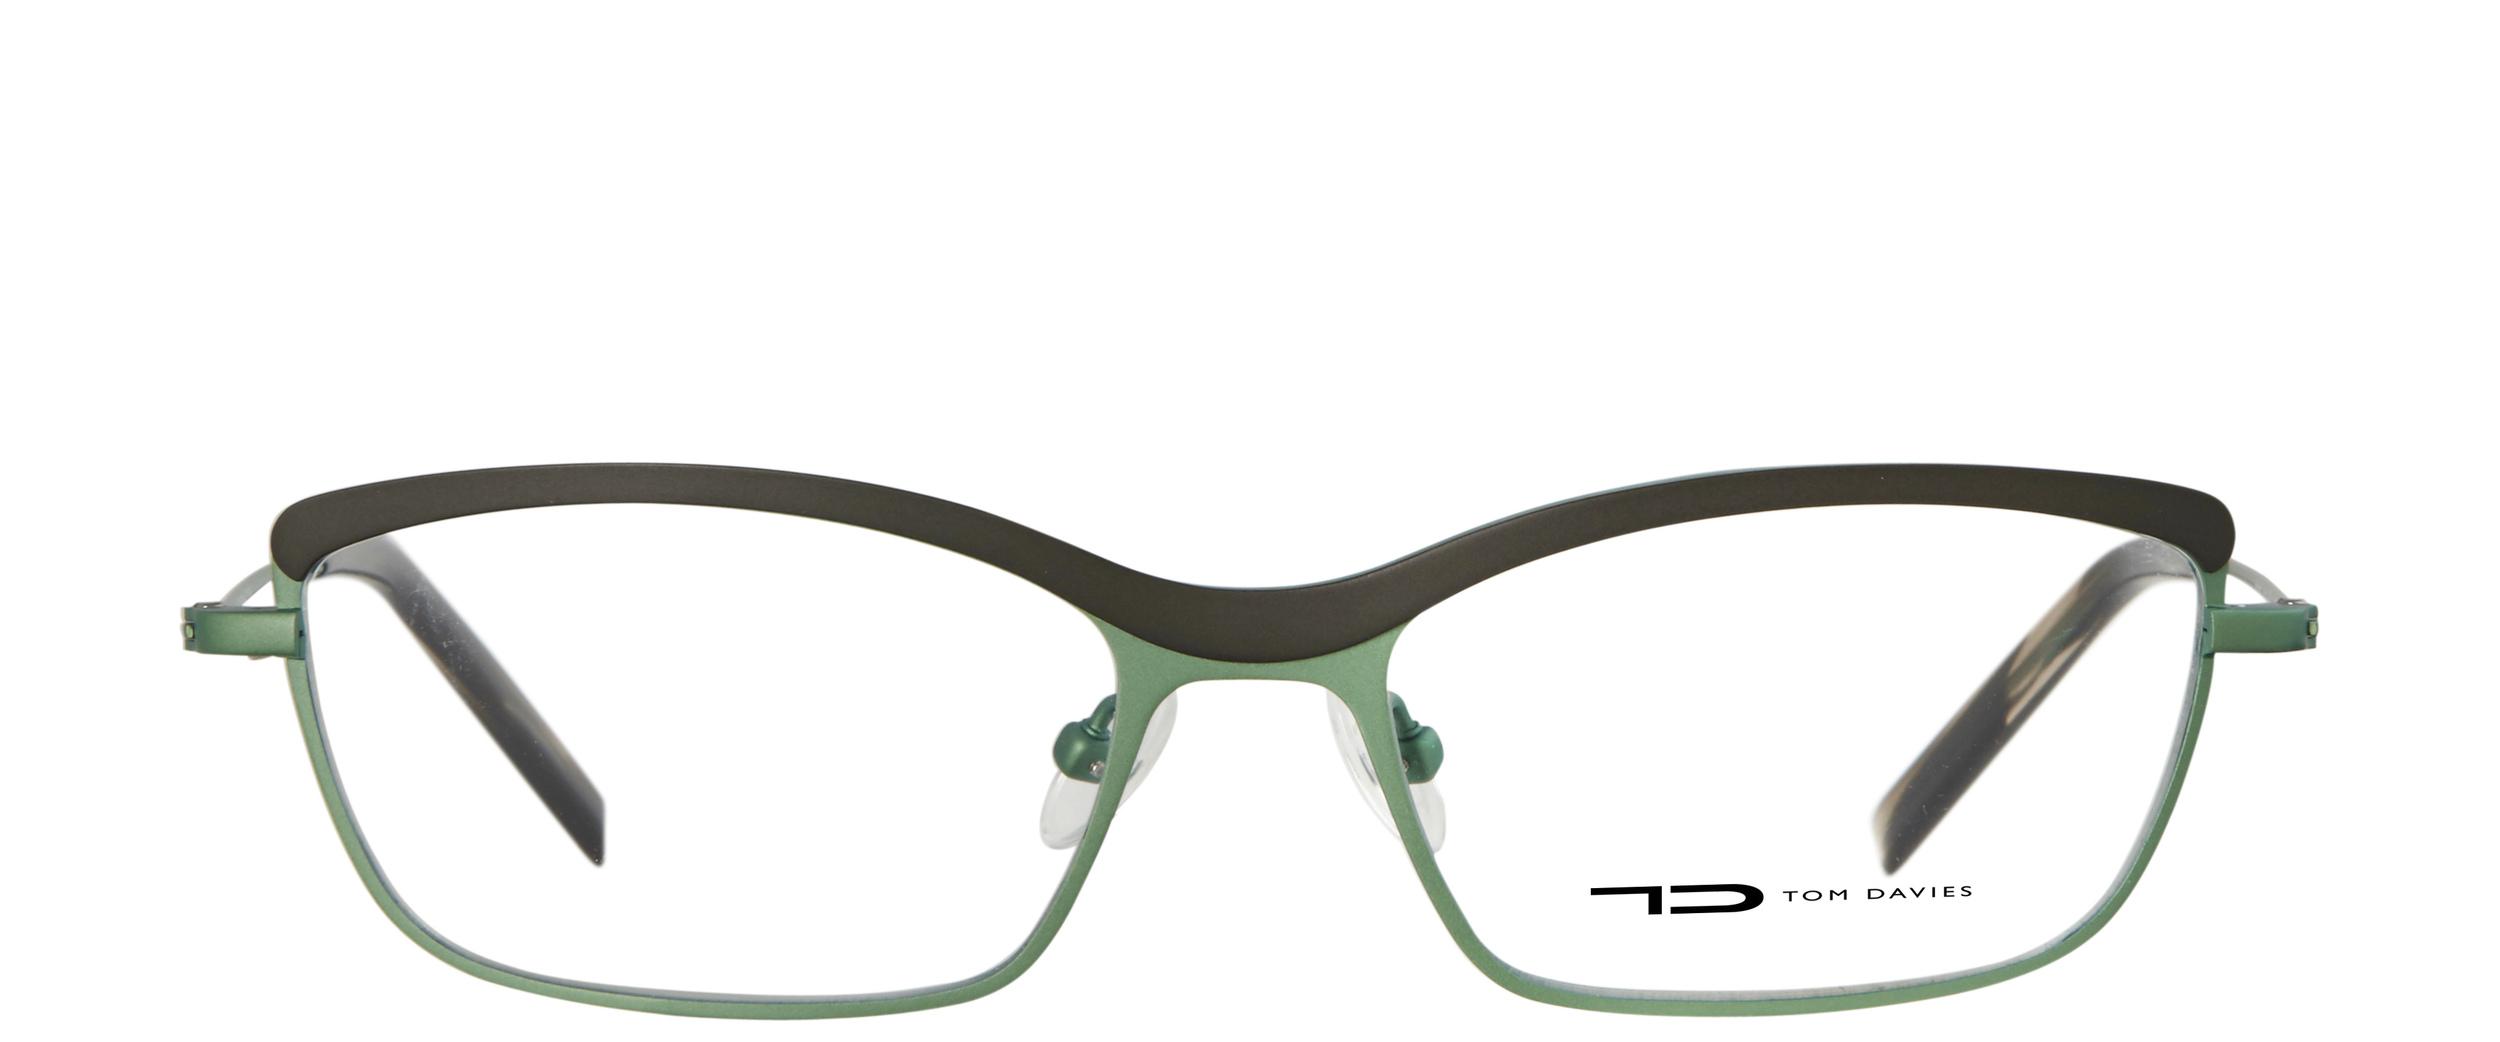 TD Tom Davies Bespoke eyewear eye-bar sherwood park -edmonton 21518.jpg